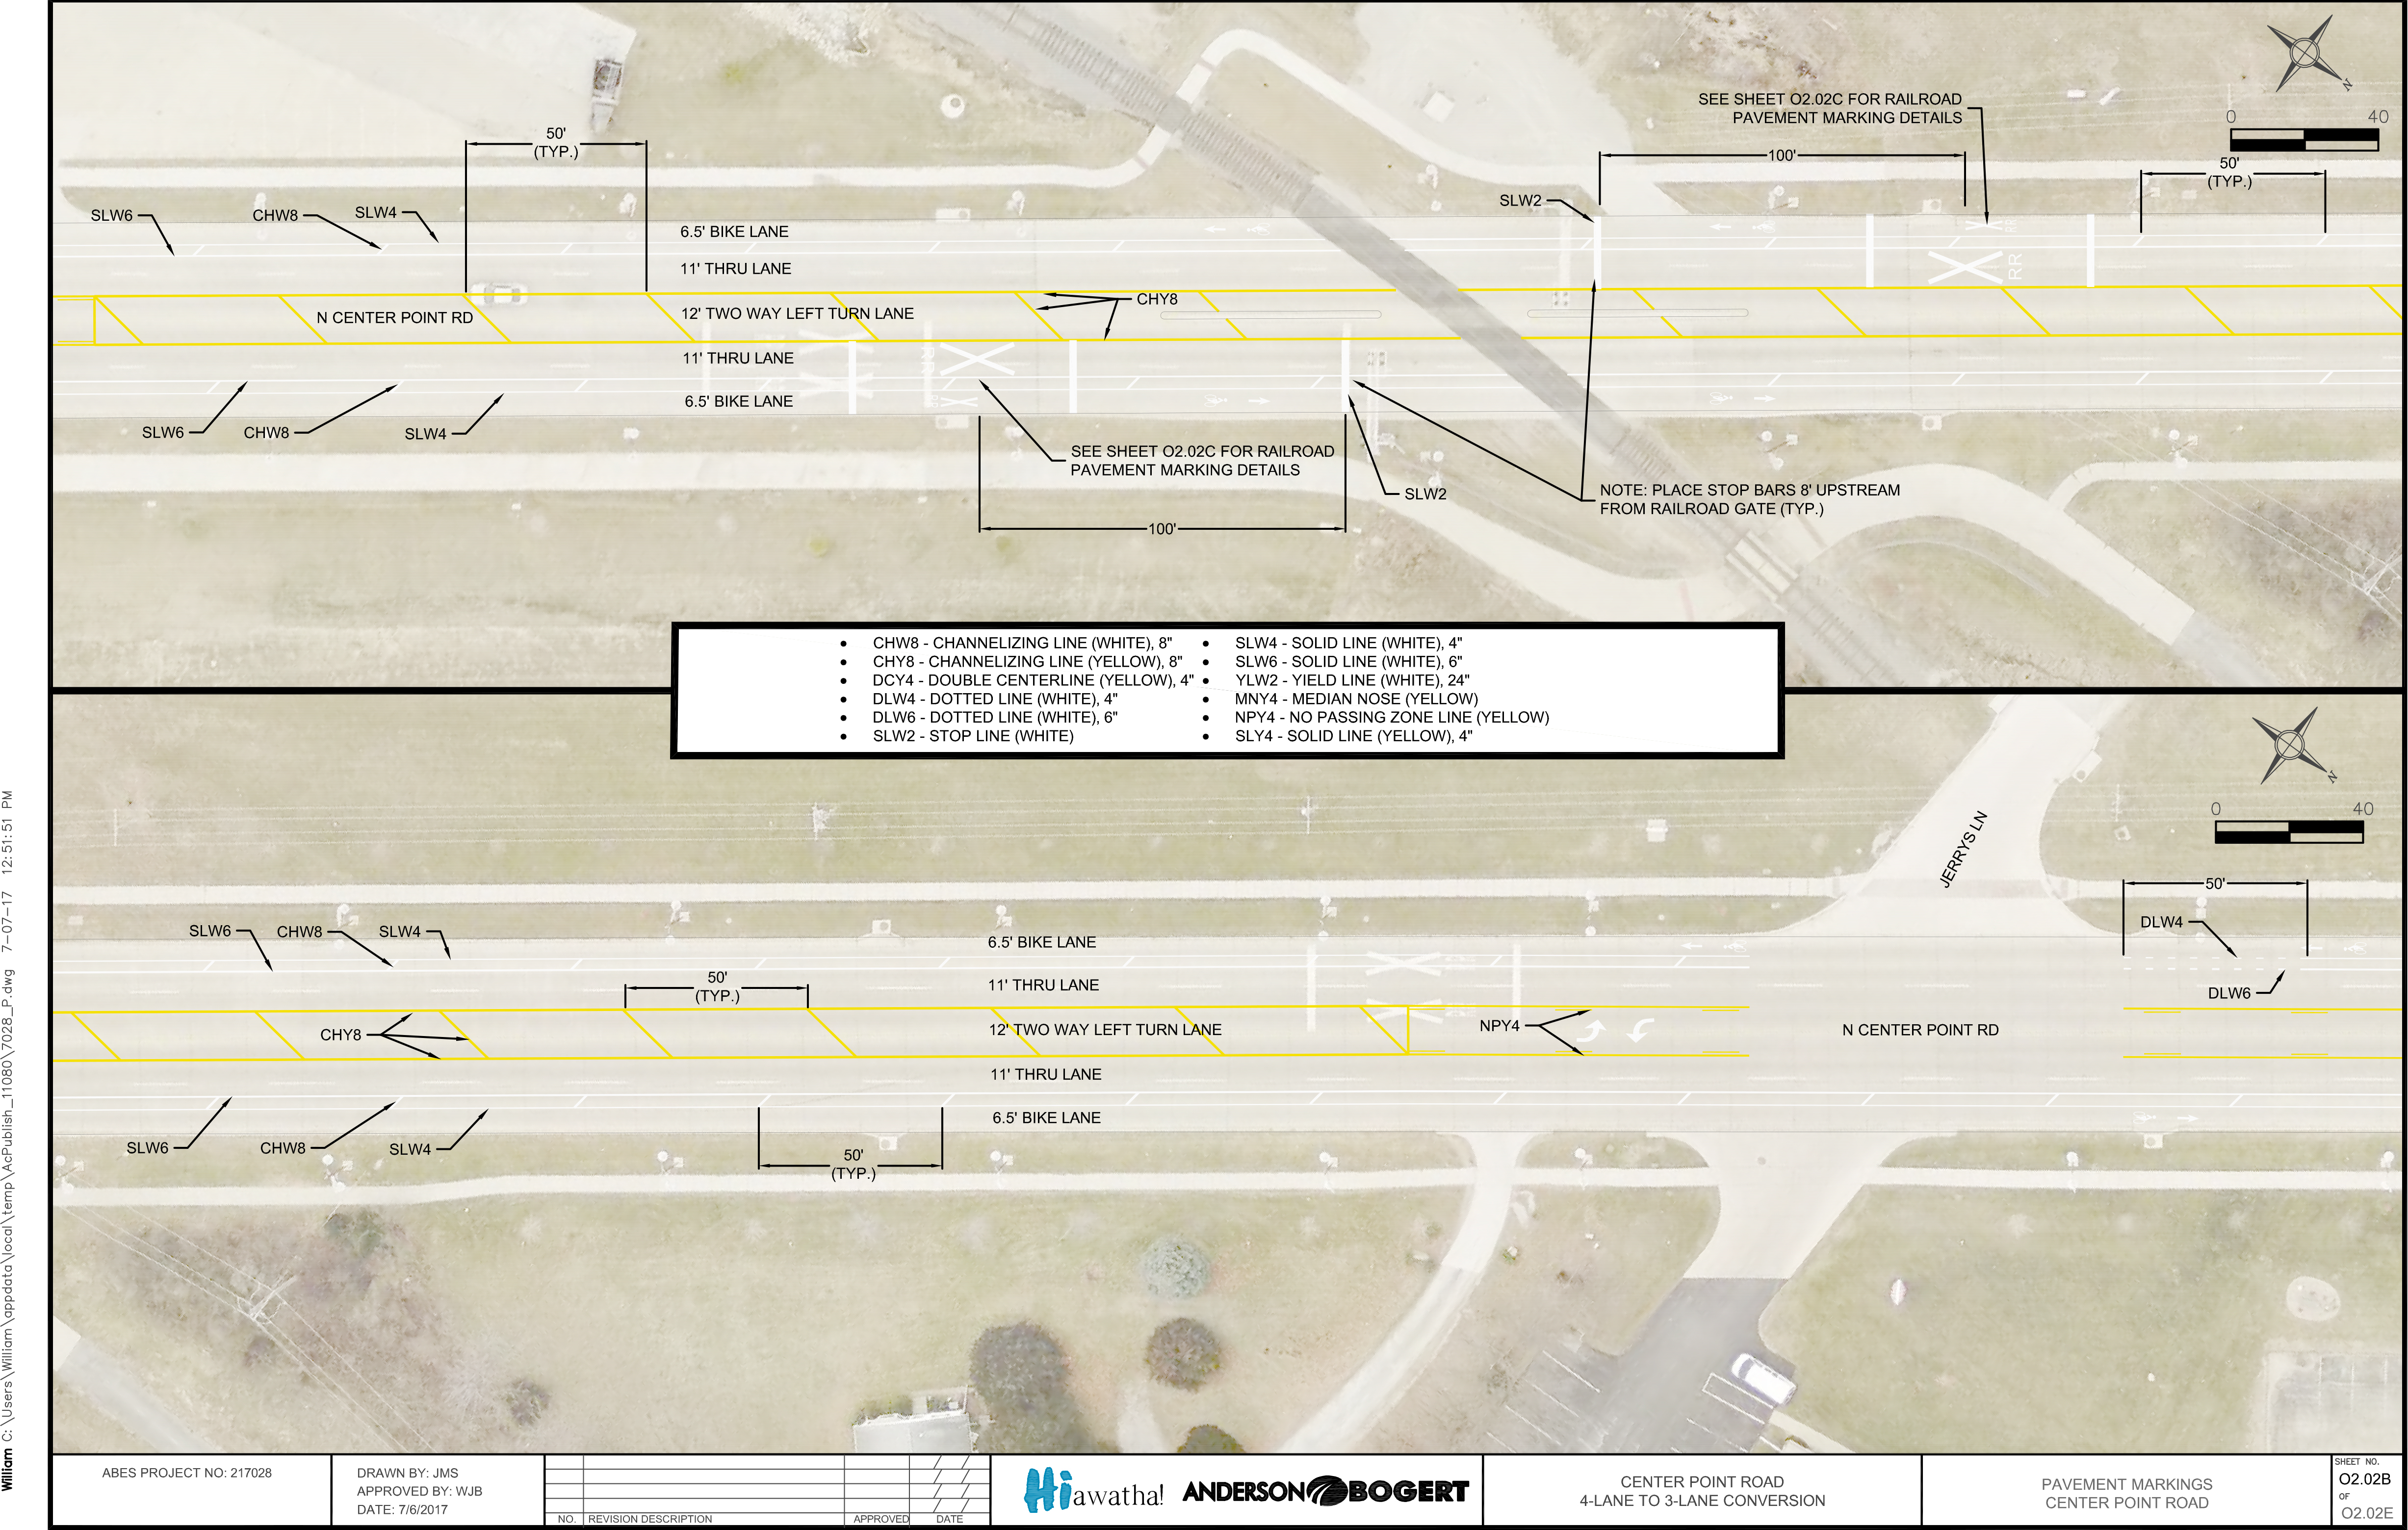 NCPR Plans-2